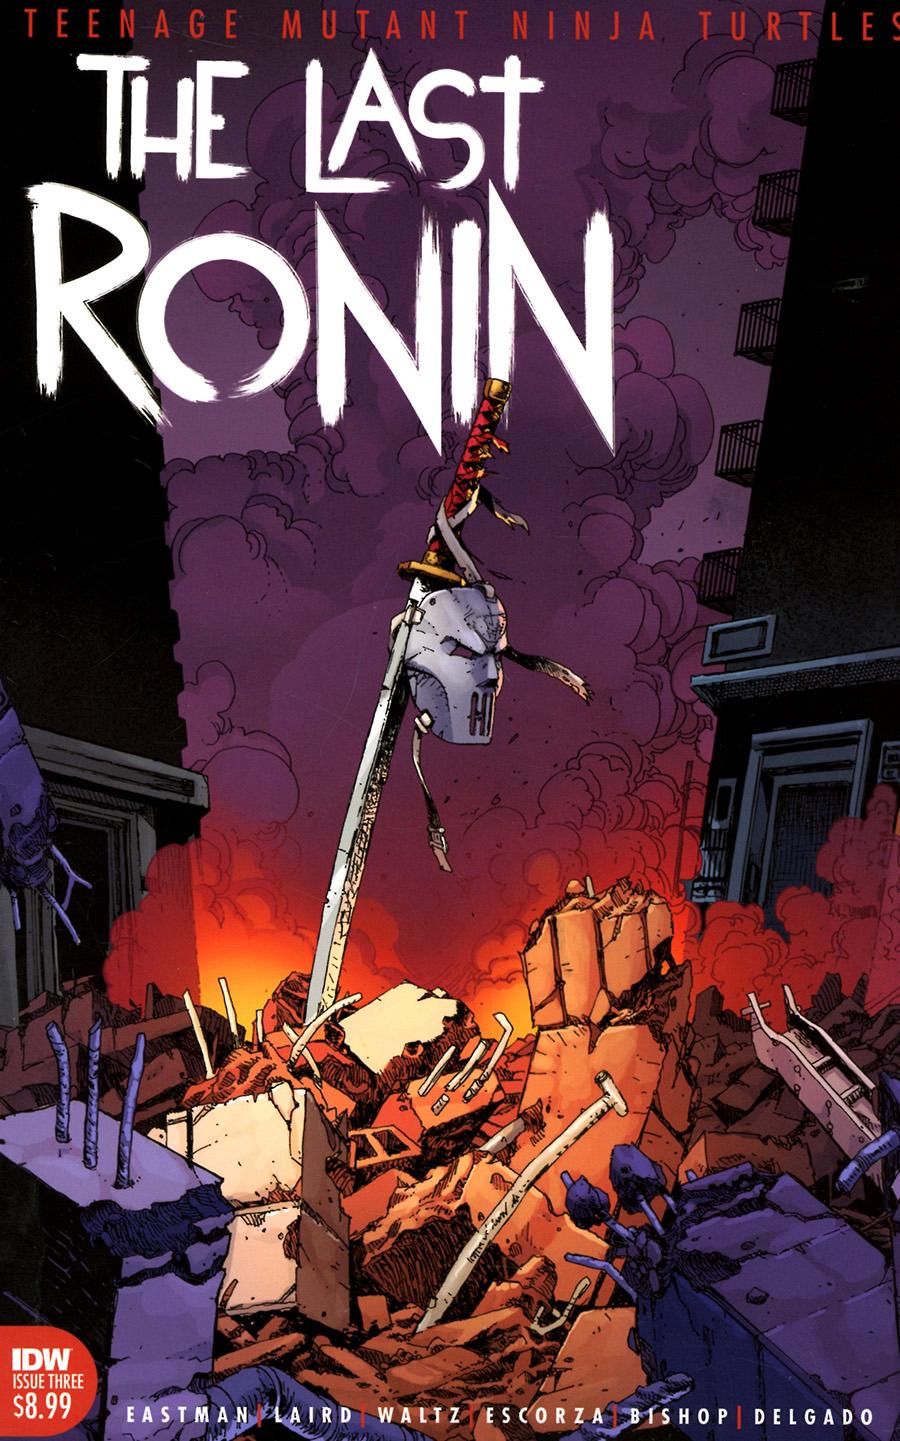 Teenage Mutant Ninja Turtles The Last Ronin #3 Cover A Regular Kevin Eastman Cover